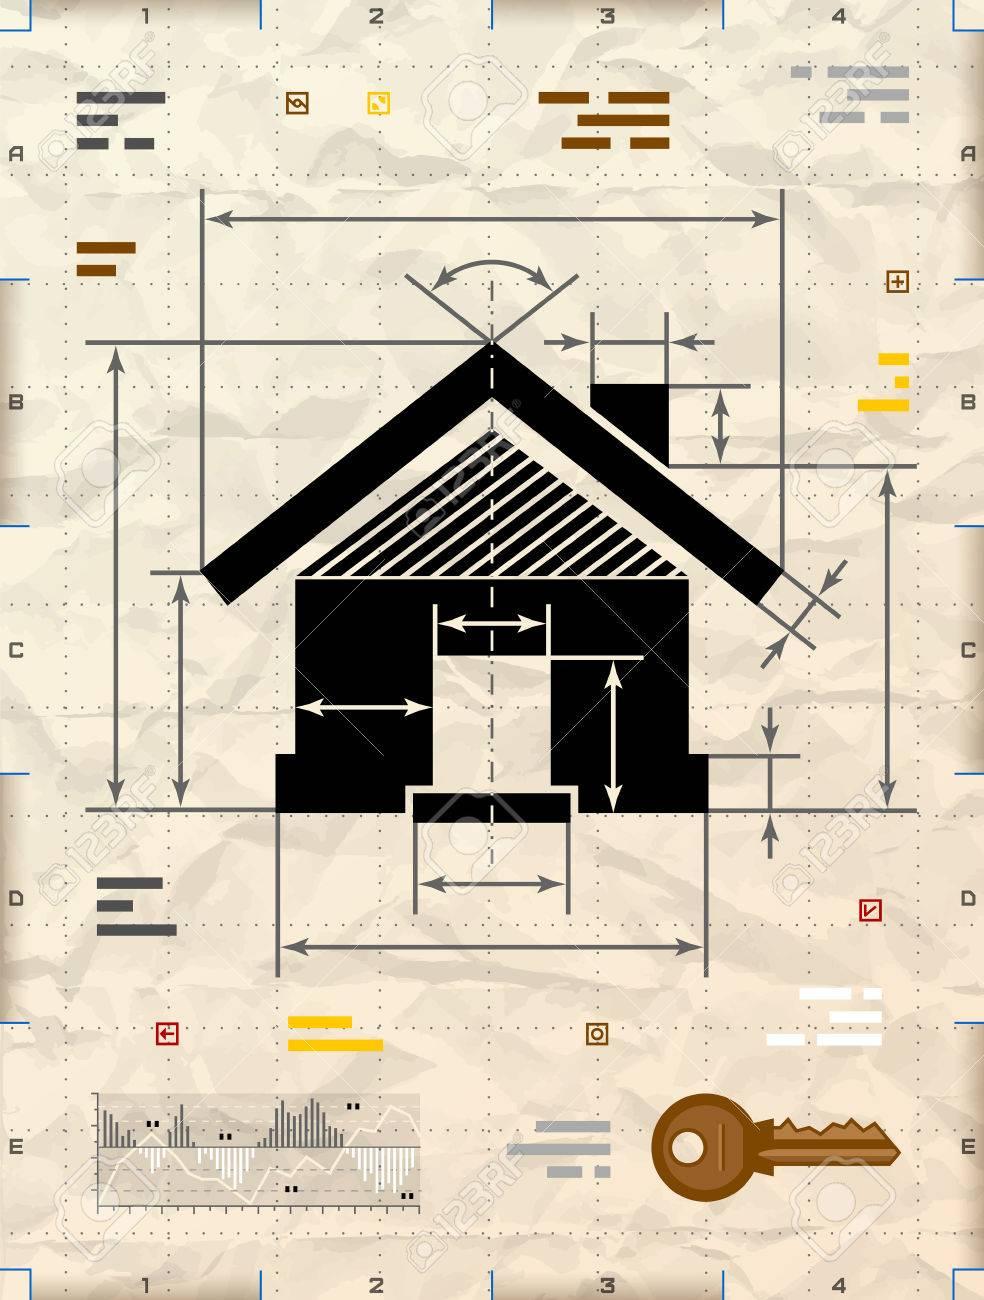 House symbol as technical blueprint drawing drafting of home house symbol as technical blueprint drawing drafting of home sign on crumpled paper qualitative malvernweather Choice Image